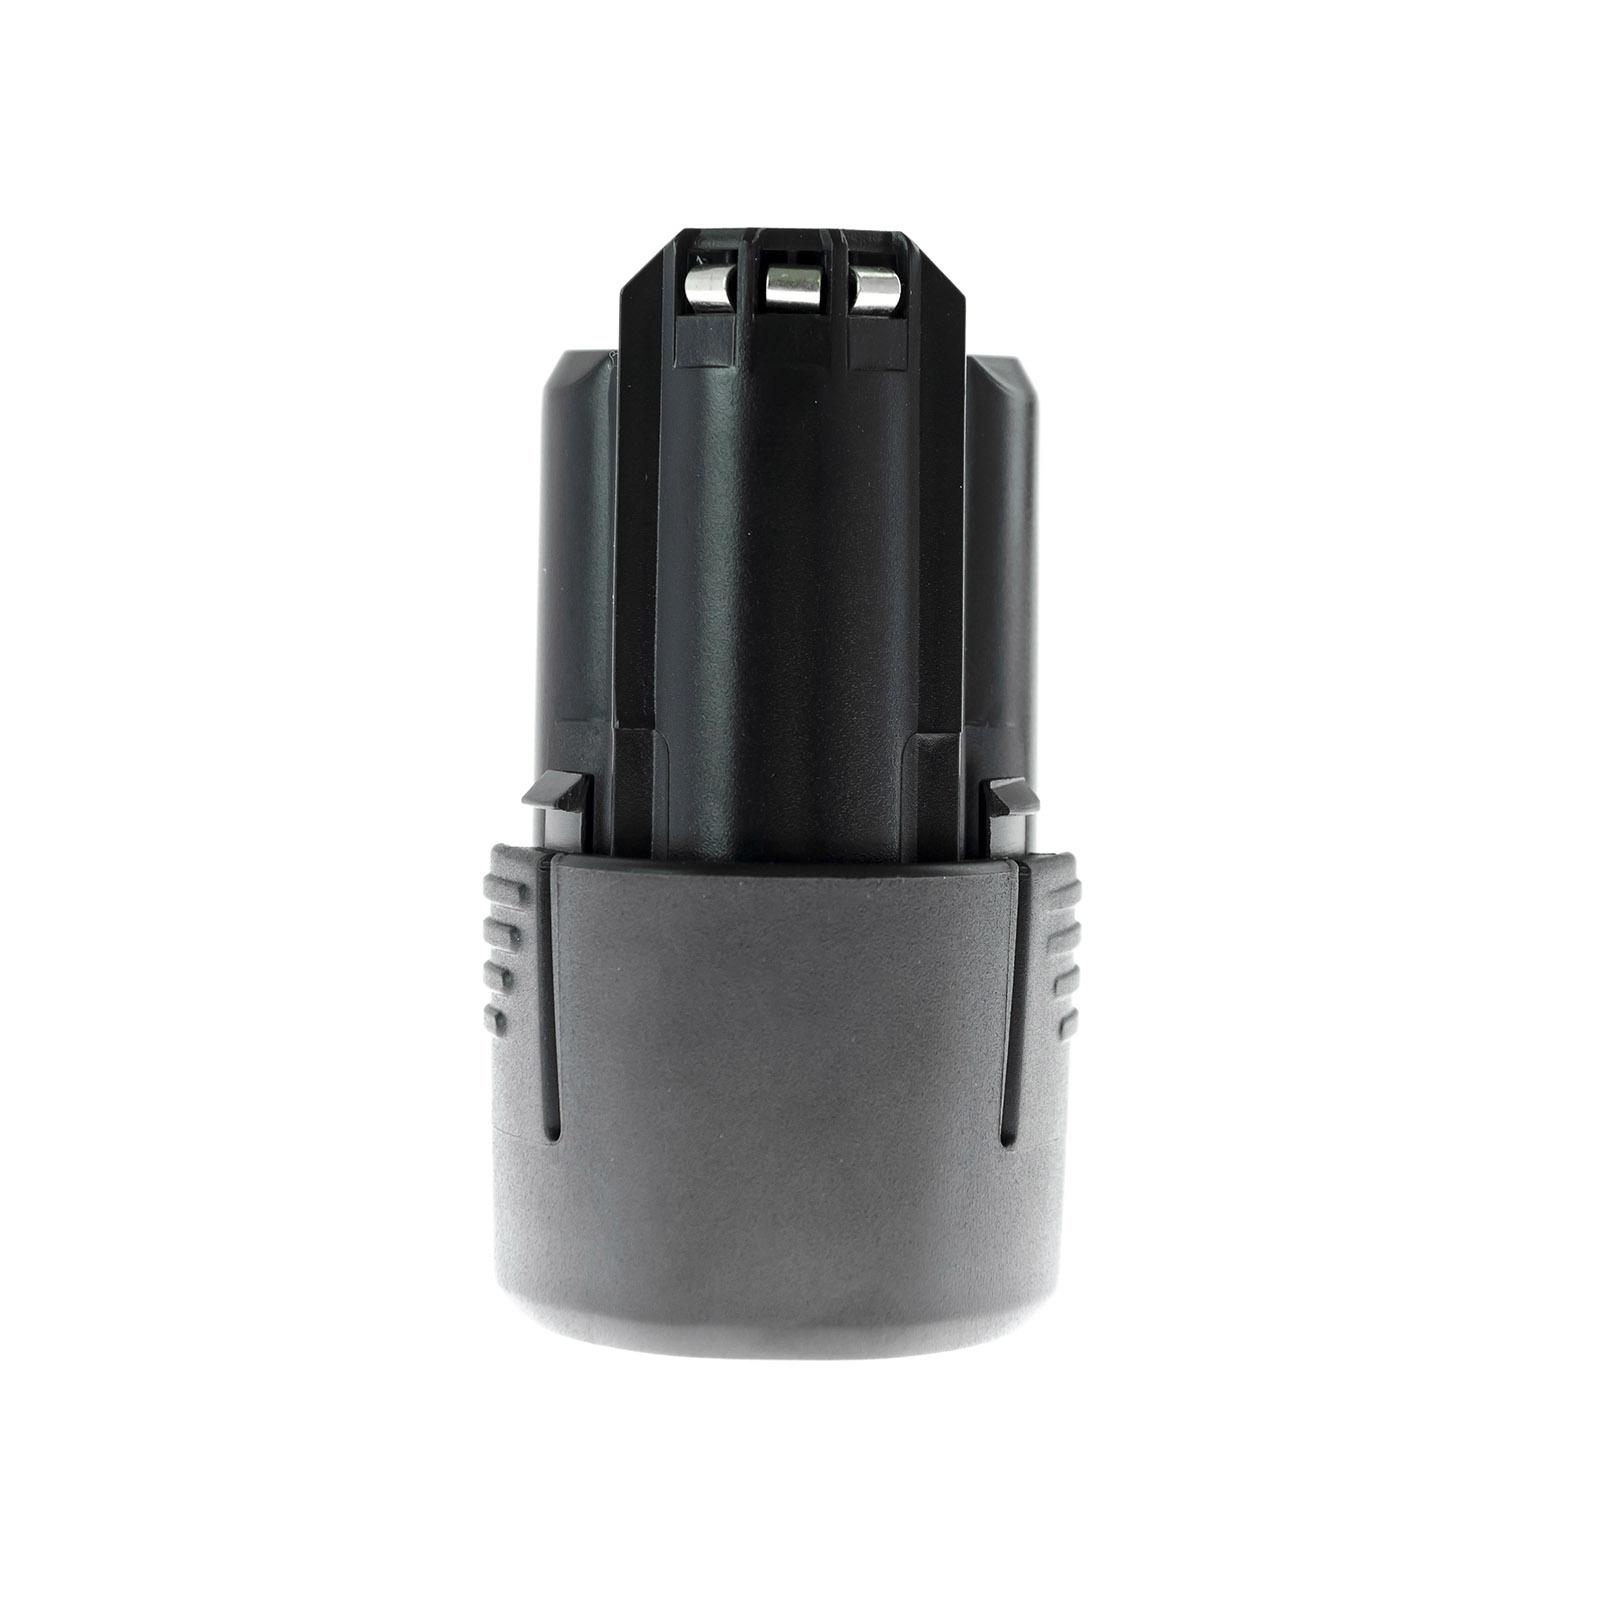 1.5Ah 10.8V GC Akku 2607337215 26150875JA 87510.8 PBA10.8 für Bosch